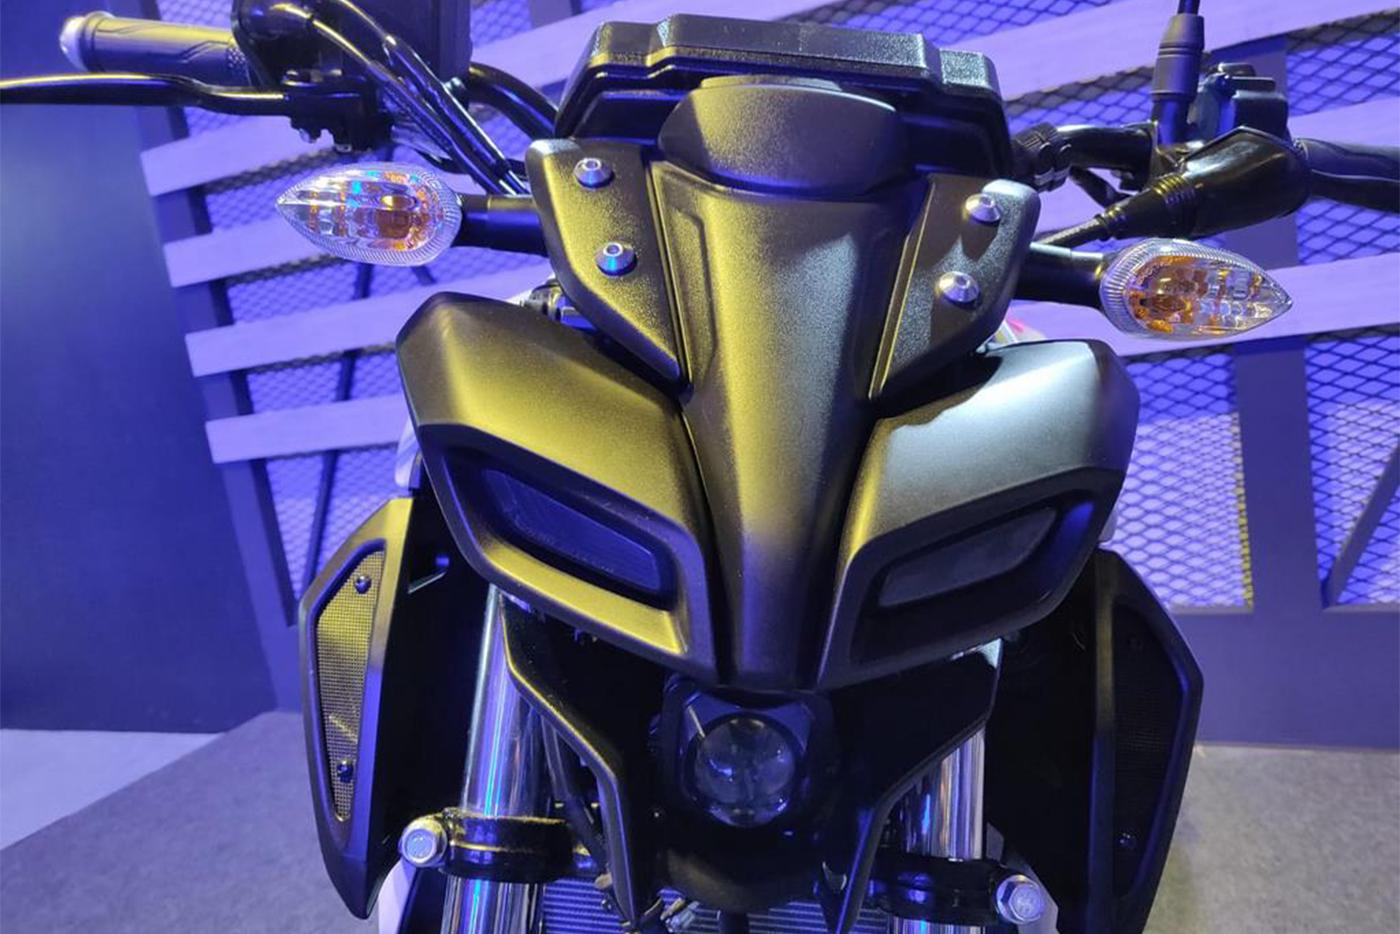 bs-vi-yamaha-mt-15-headlamp-0000.jpg